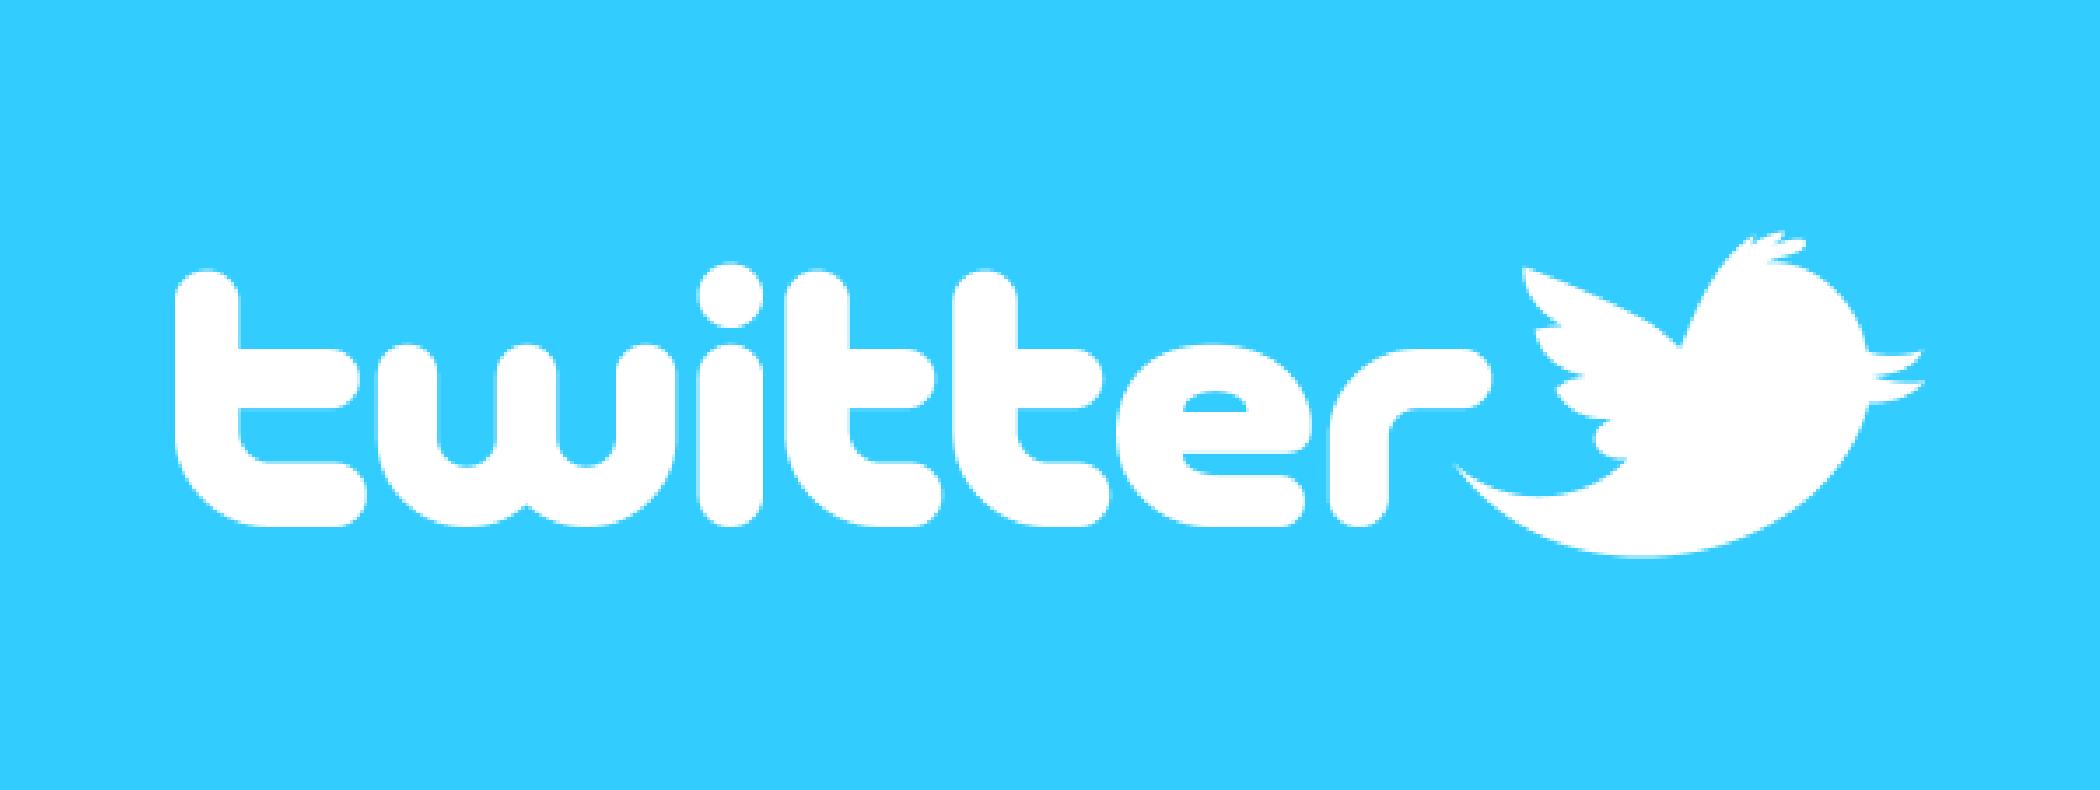 twitter-1